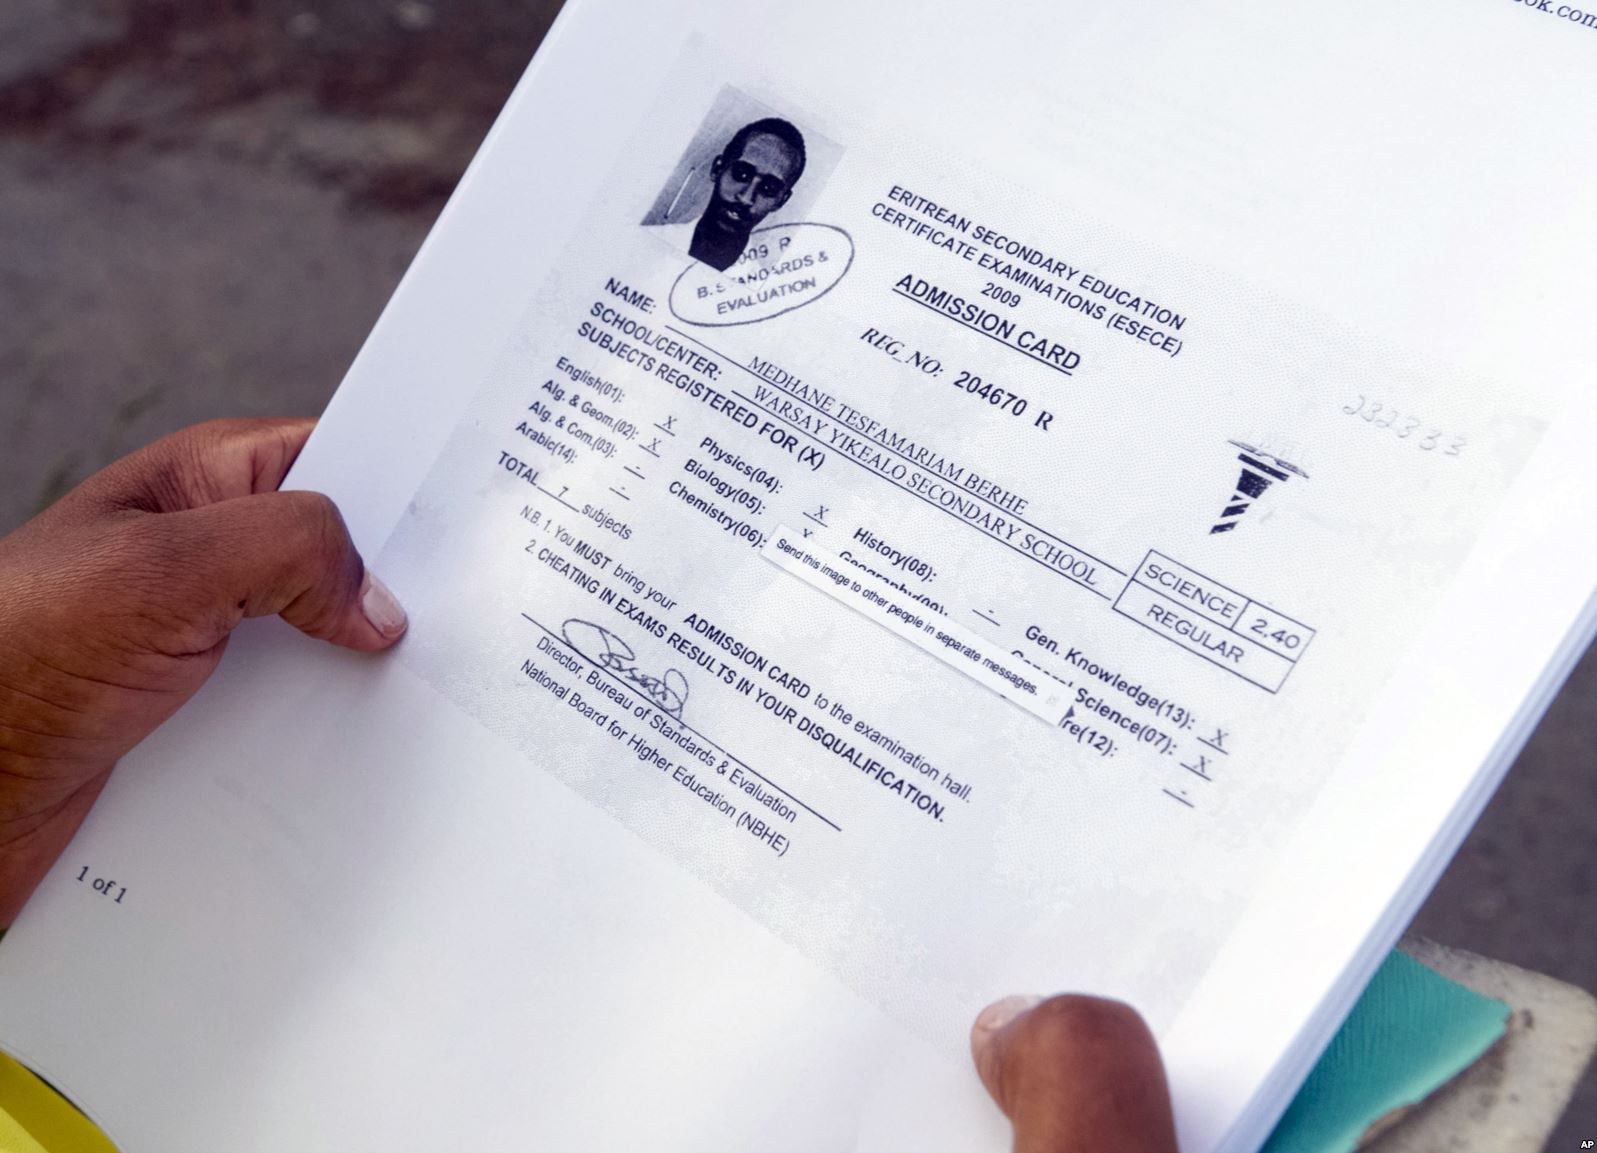 Hiwet Tesfamariam Berhe holds photocopies of school documents